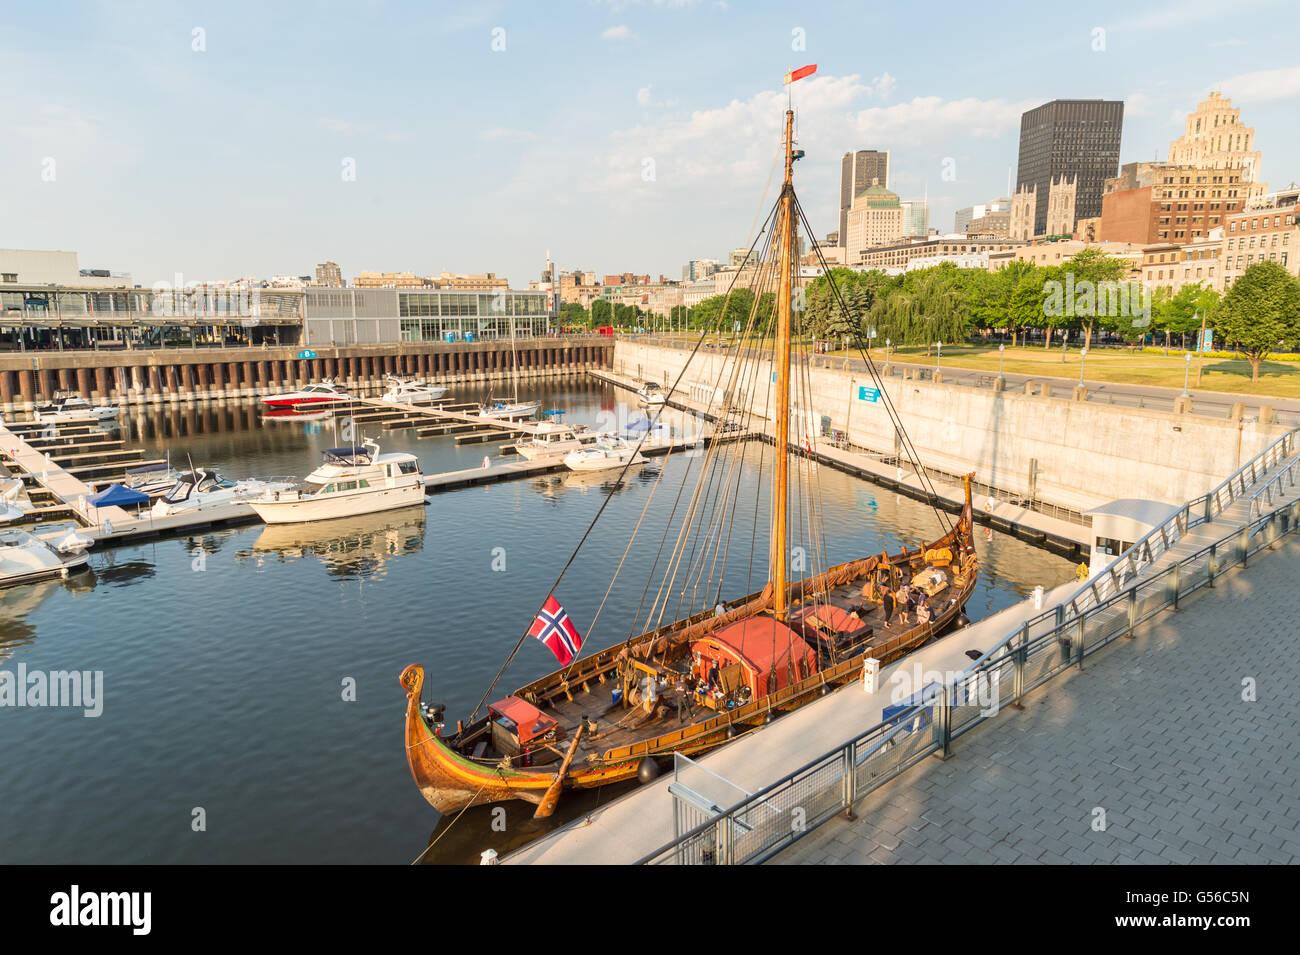 Montreal, Canada. 20th June 2016. Viking drakkar 'Draken Harald Harfagre' is moored in Montreal Old Port, - Stock Image